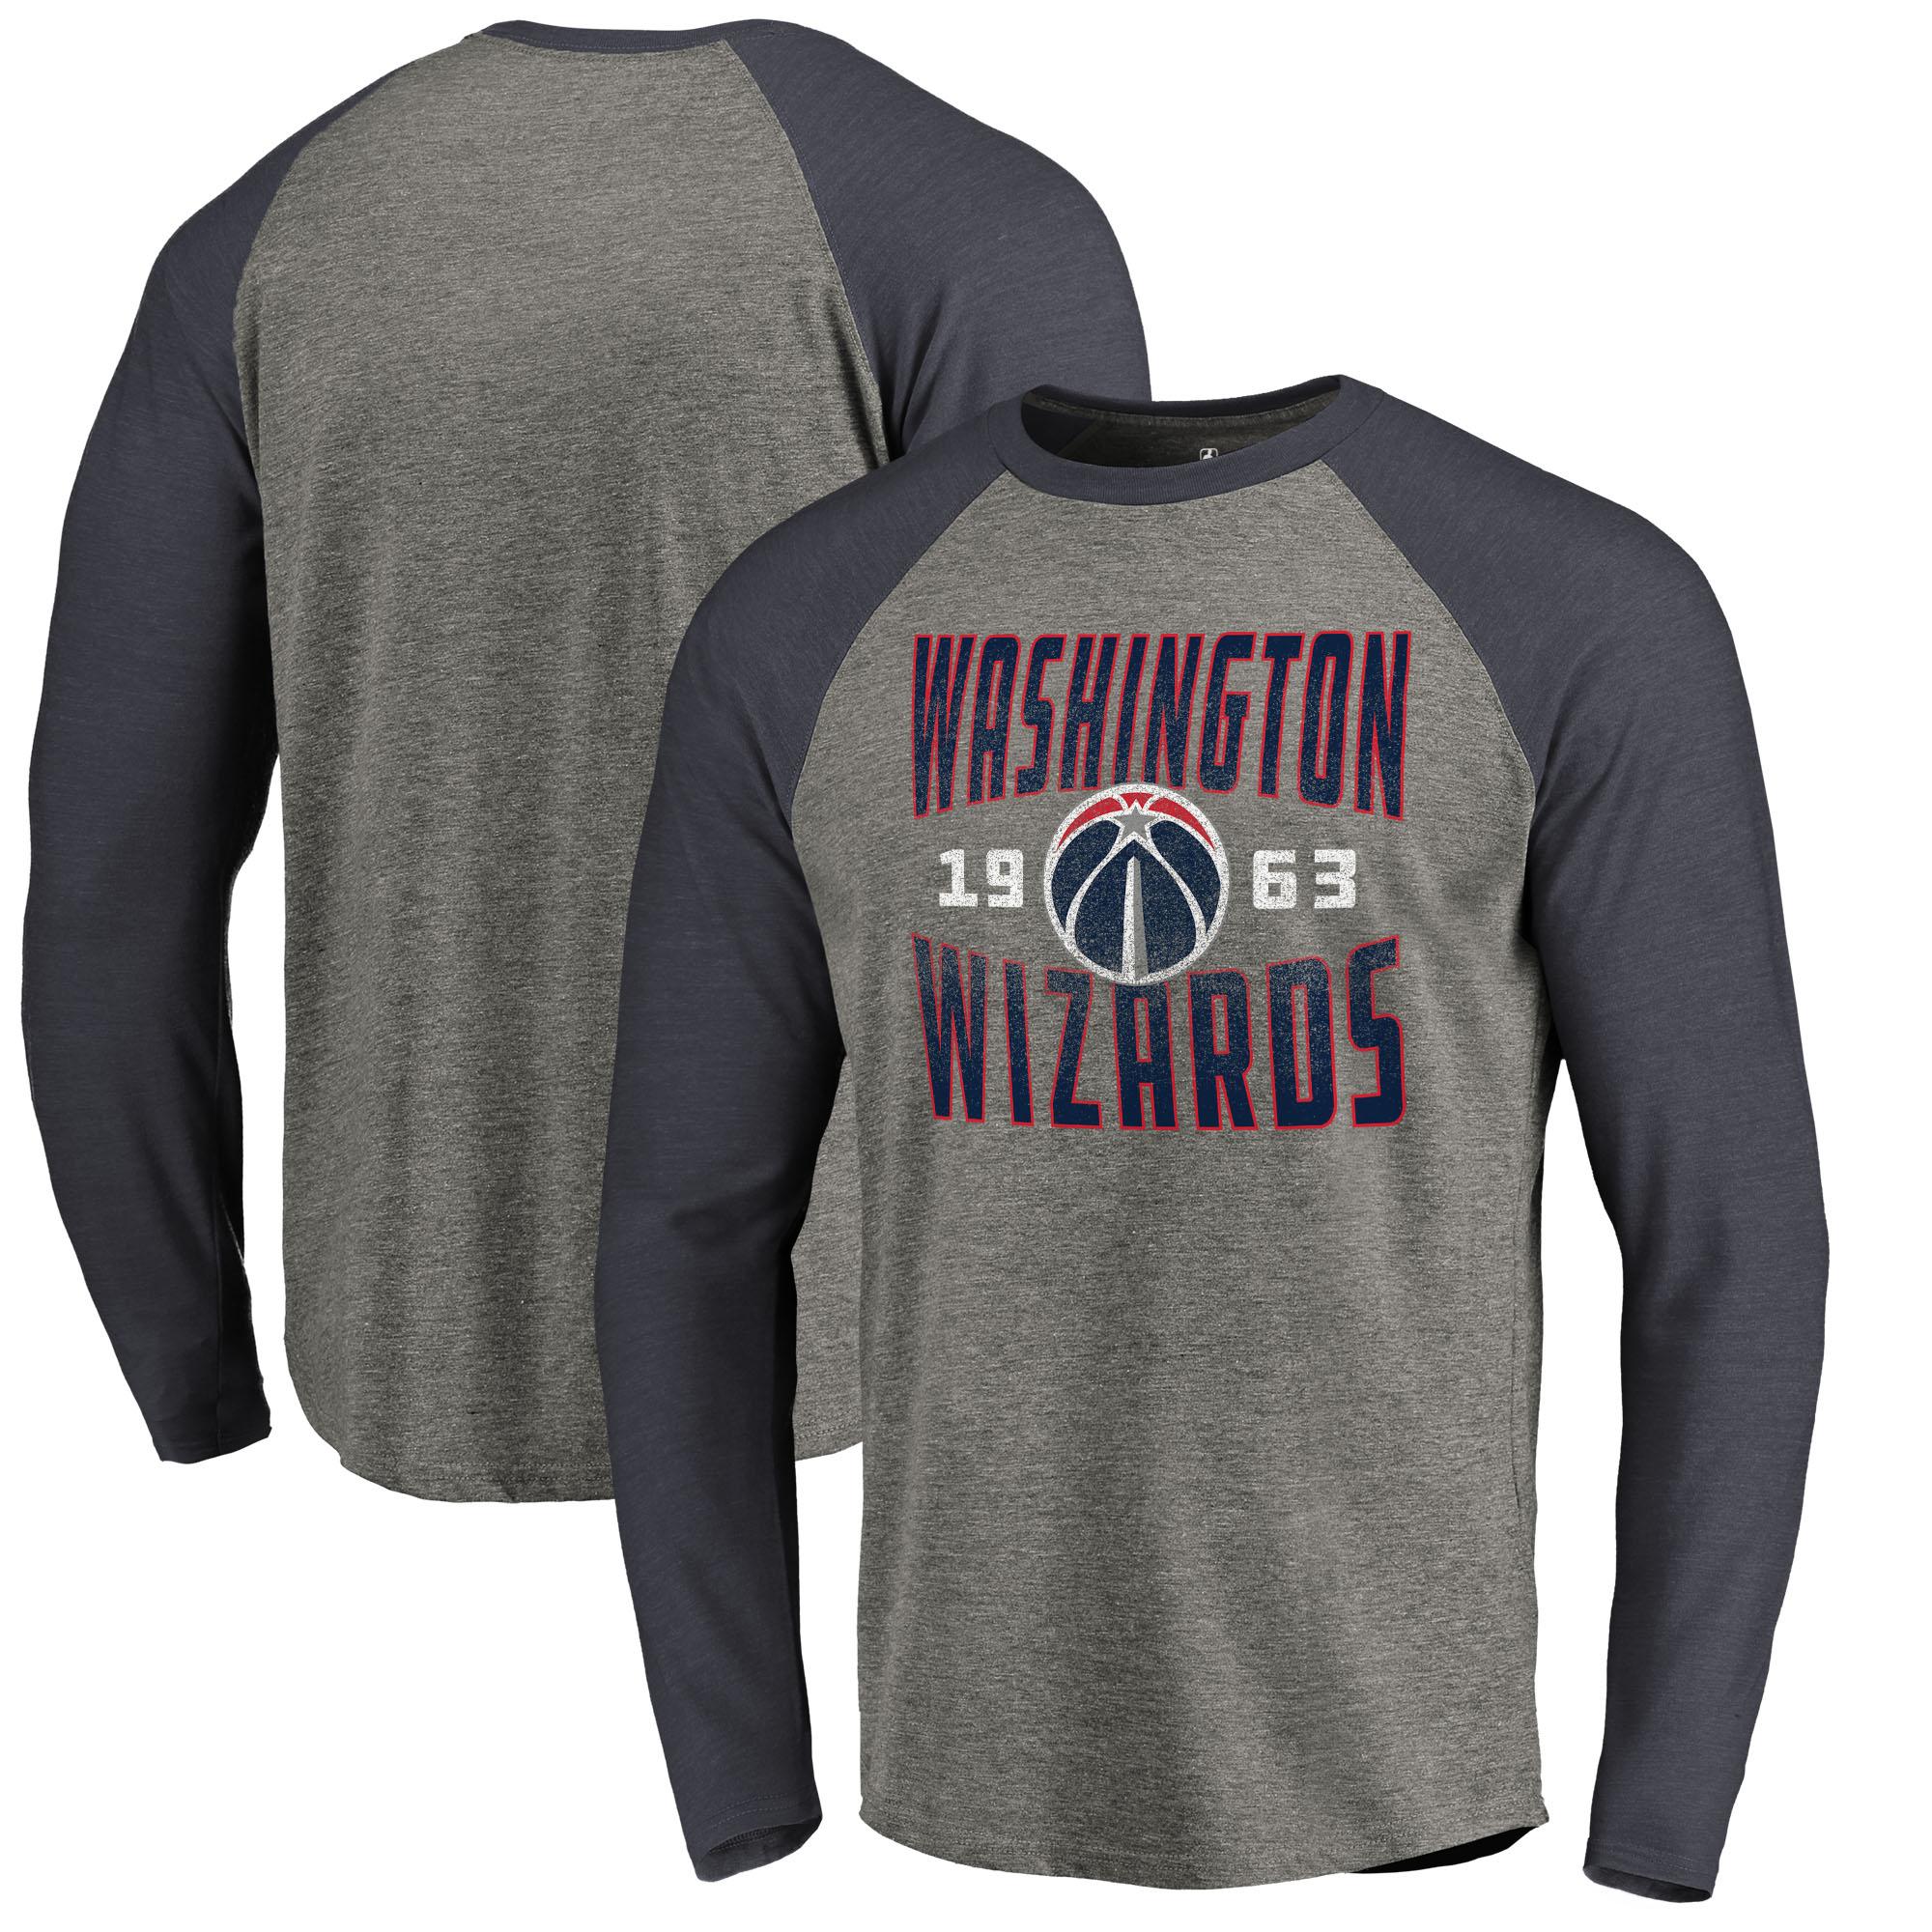 Washington Wizards Fanatics Branded Antique Stack Long Sleeve Tri-Blend Raglan T-Shirt - Ash